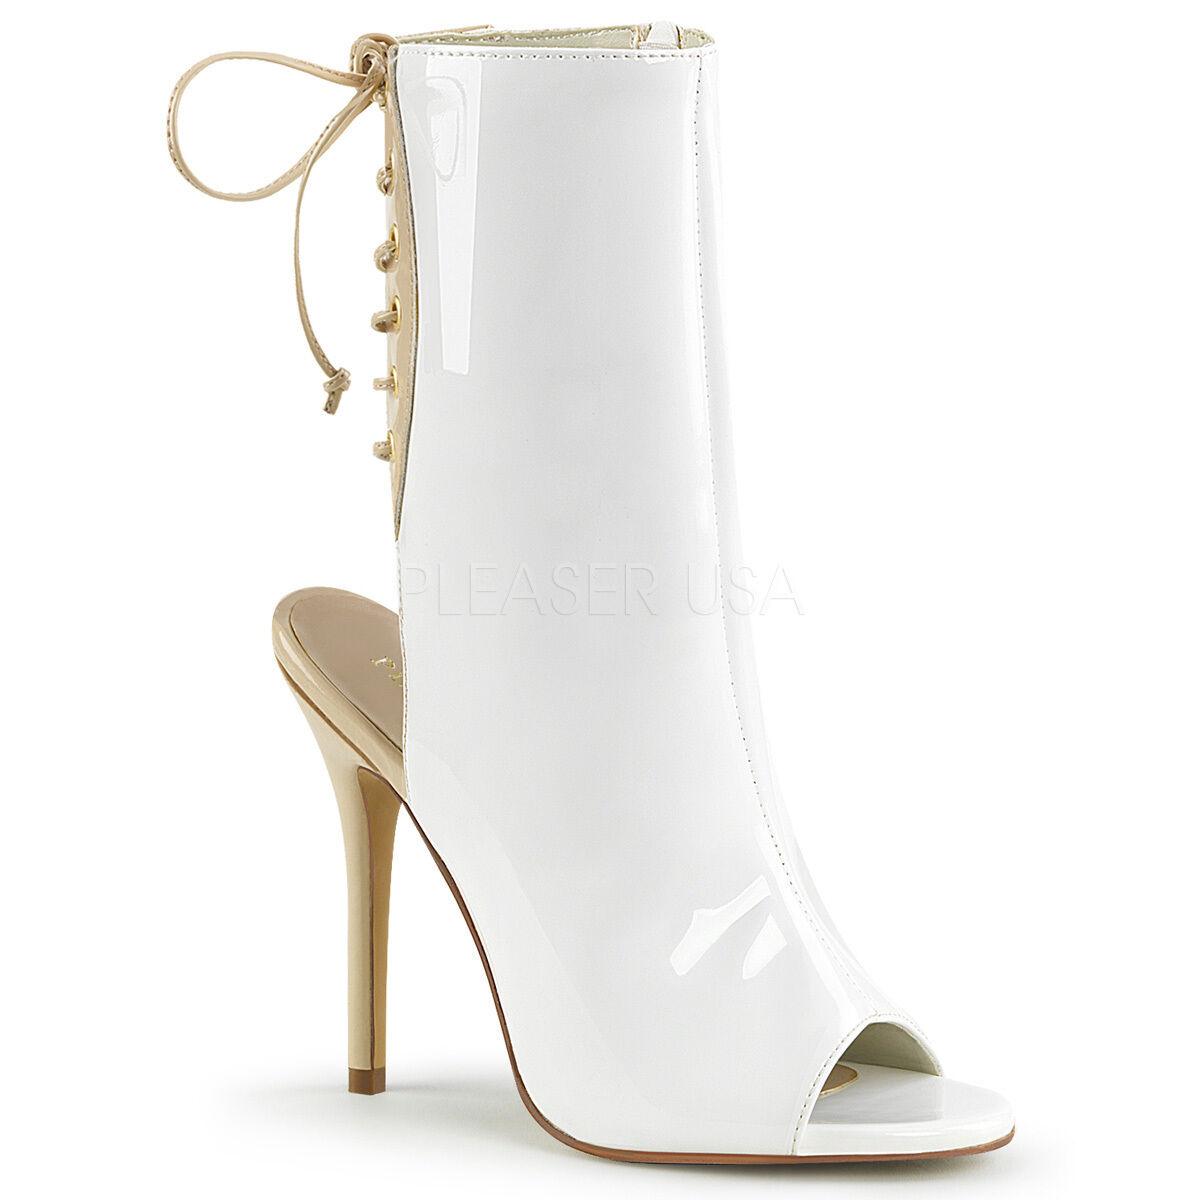 Pleaser Größe AMUSE-1018 Open Toe Ankle Stiefel Größe Pleaser 5-14 7c80be